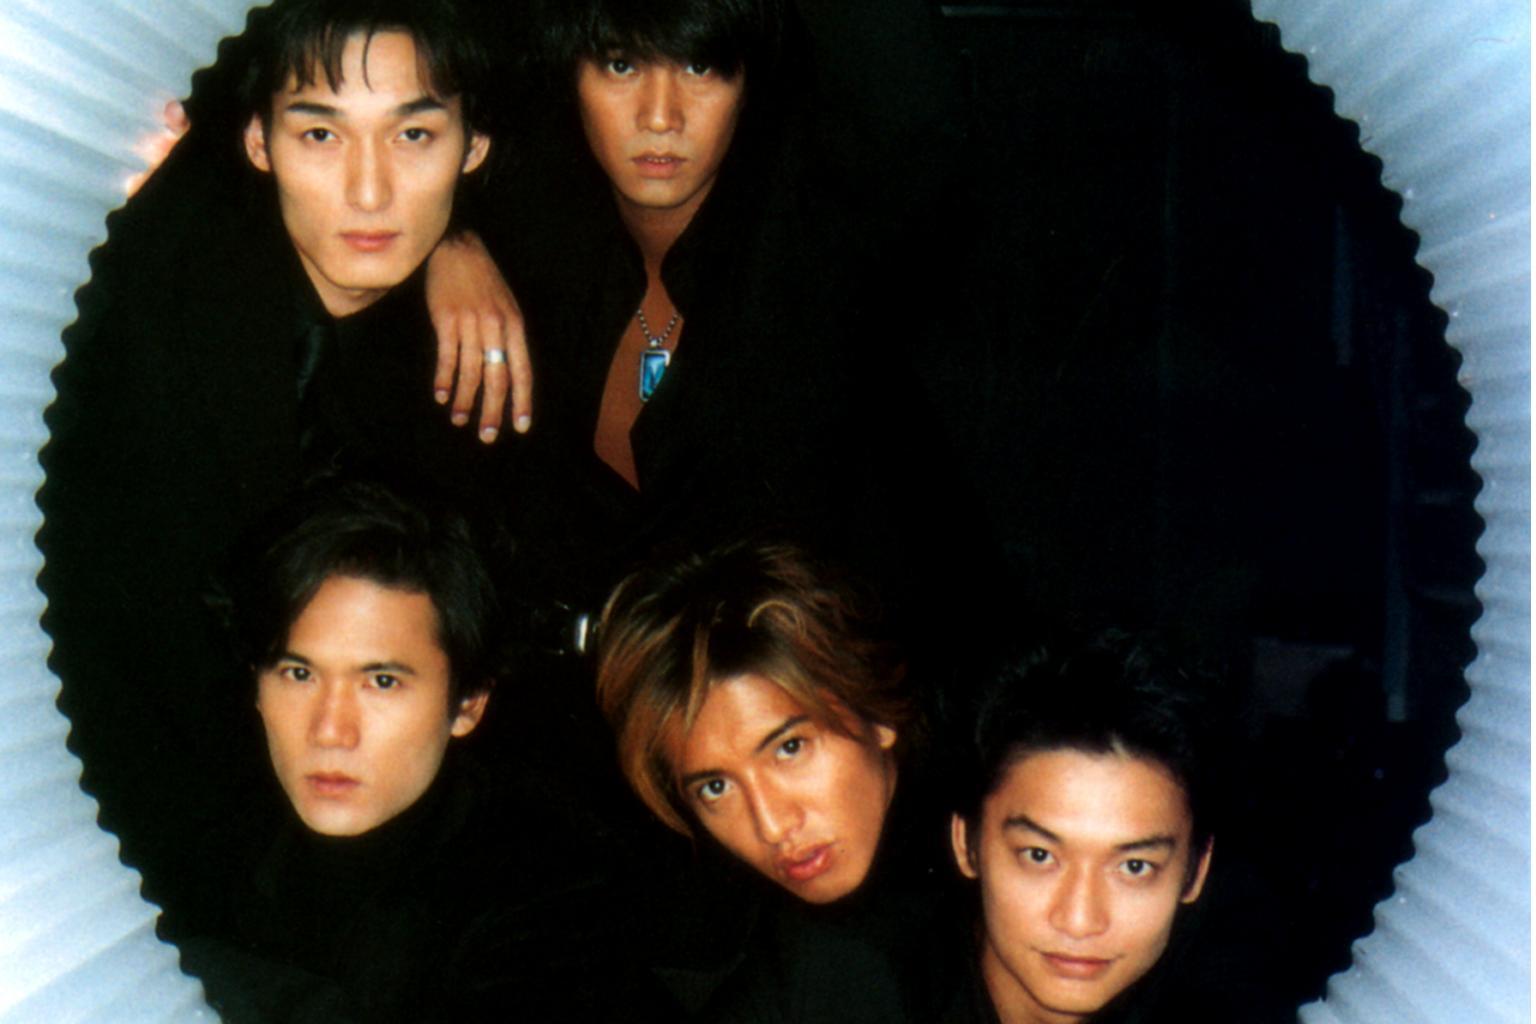 J-pop group SMAP (clockwise from bottom right) Shingo Katori, Takuya  Kimura, Goro Inagaki, Tsuyoshi Kasanagi and Nakai Masahiro.